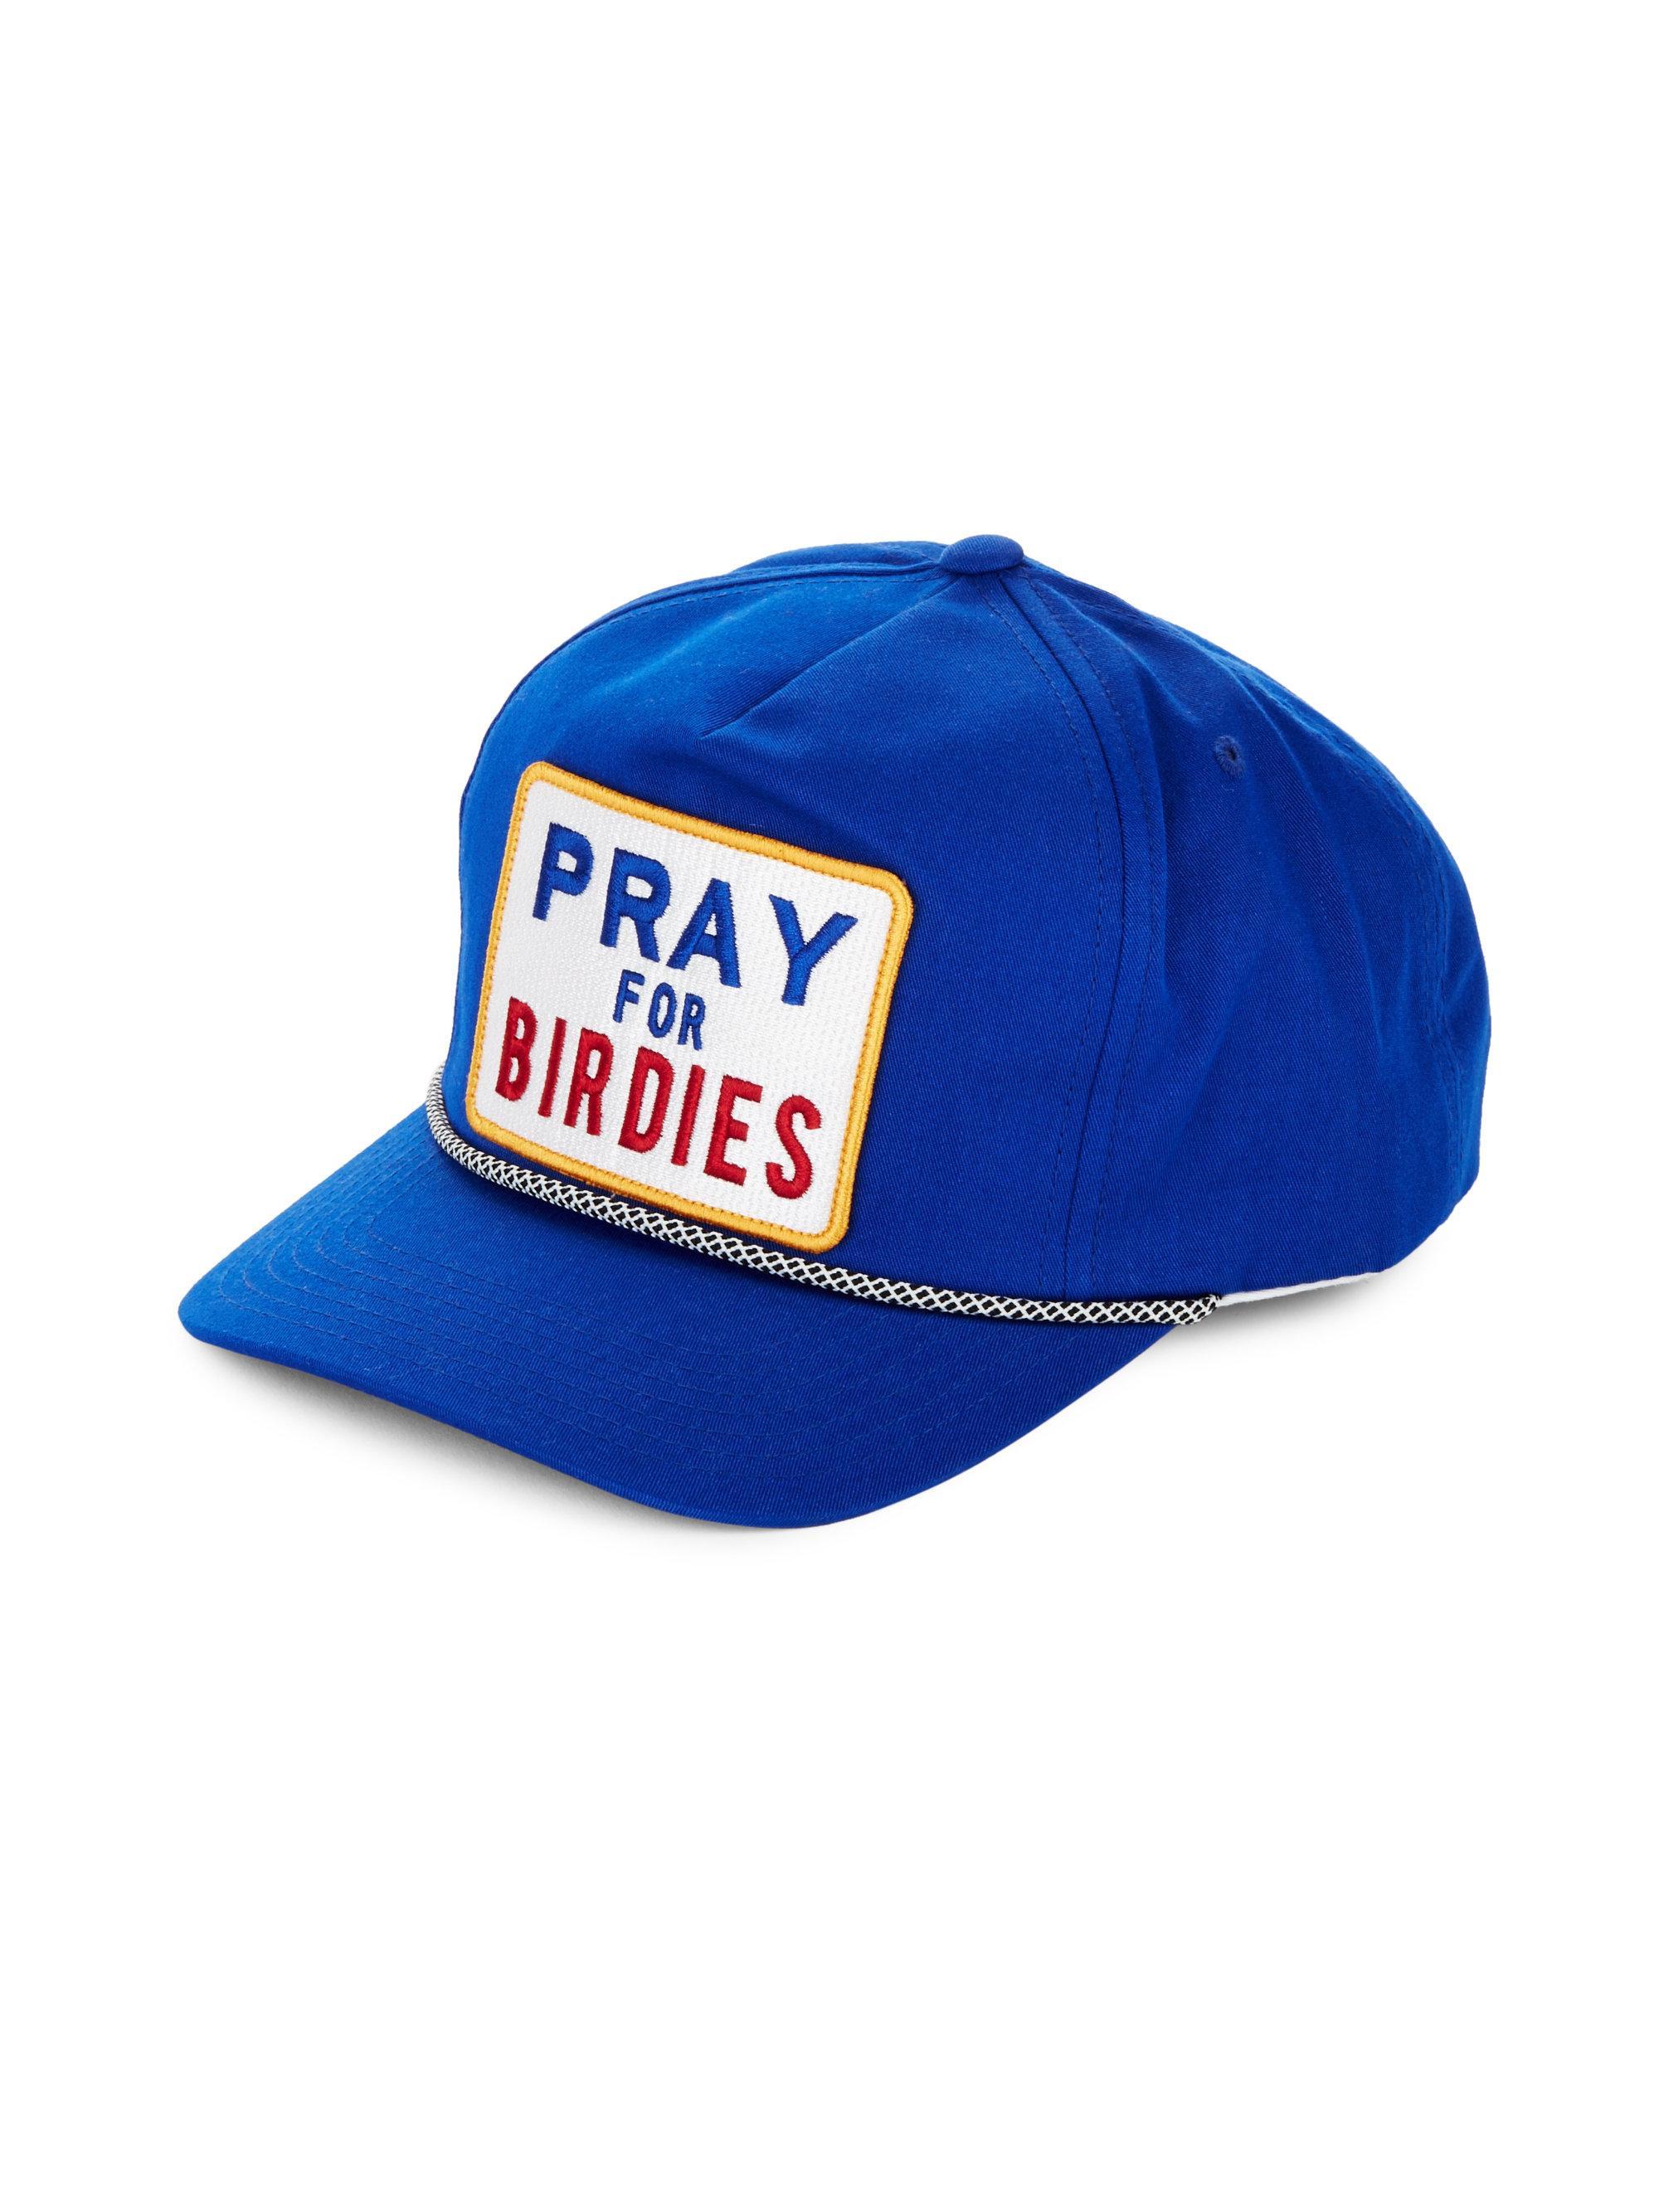 Lyst - G FORE Pray For Birdies Cotton Baseball Cap in Blue for Men 9056ba5d539